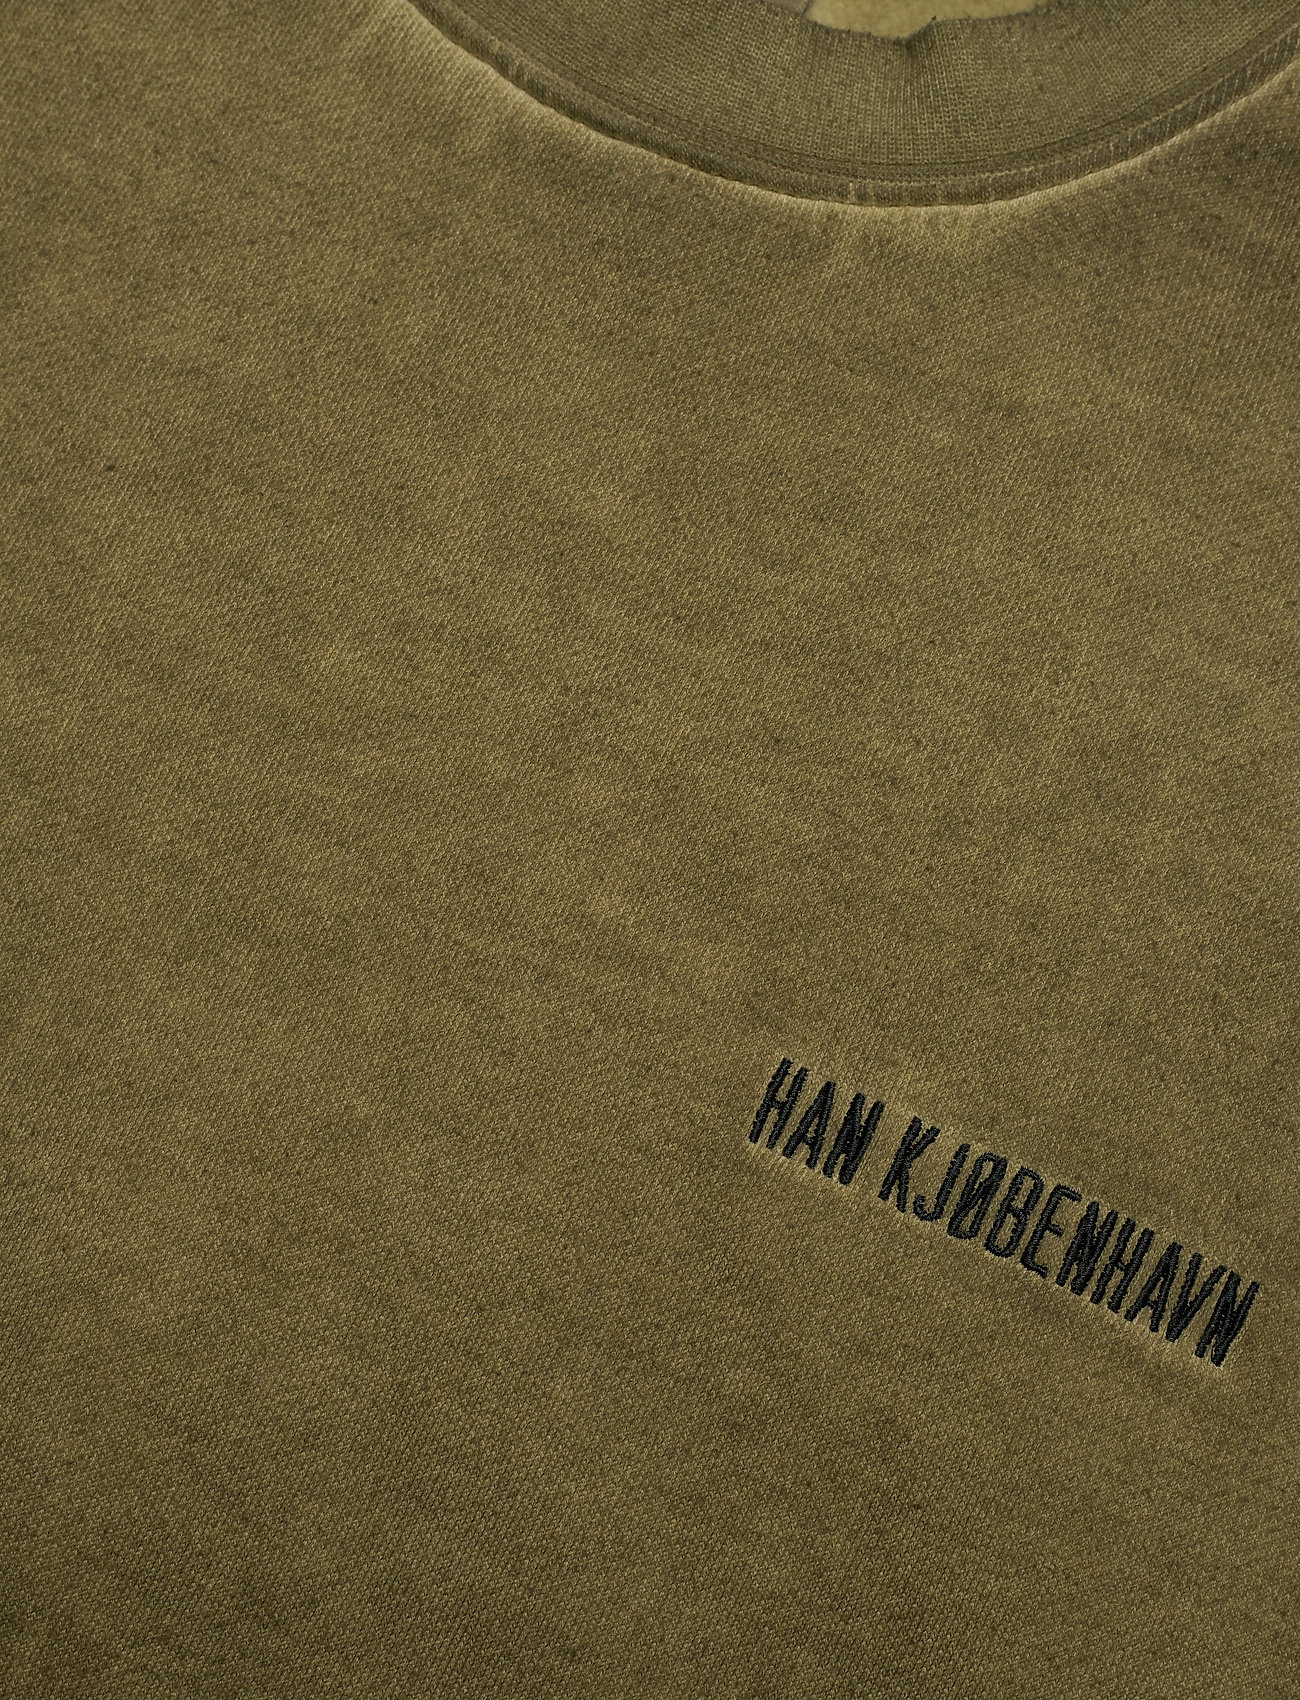 HAN Kjøbenhavn - Casual Crew - basic sweatshirts - green crush - 5